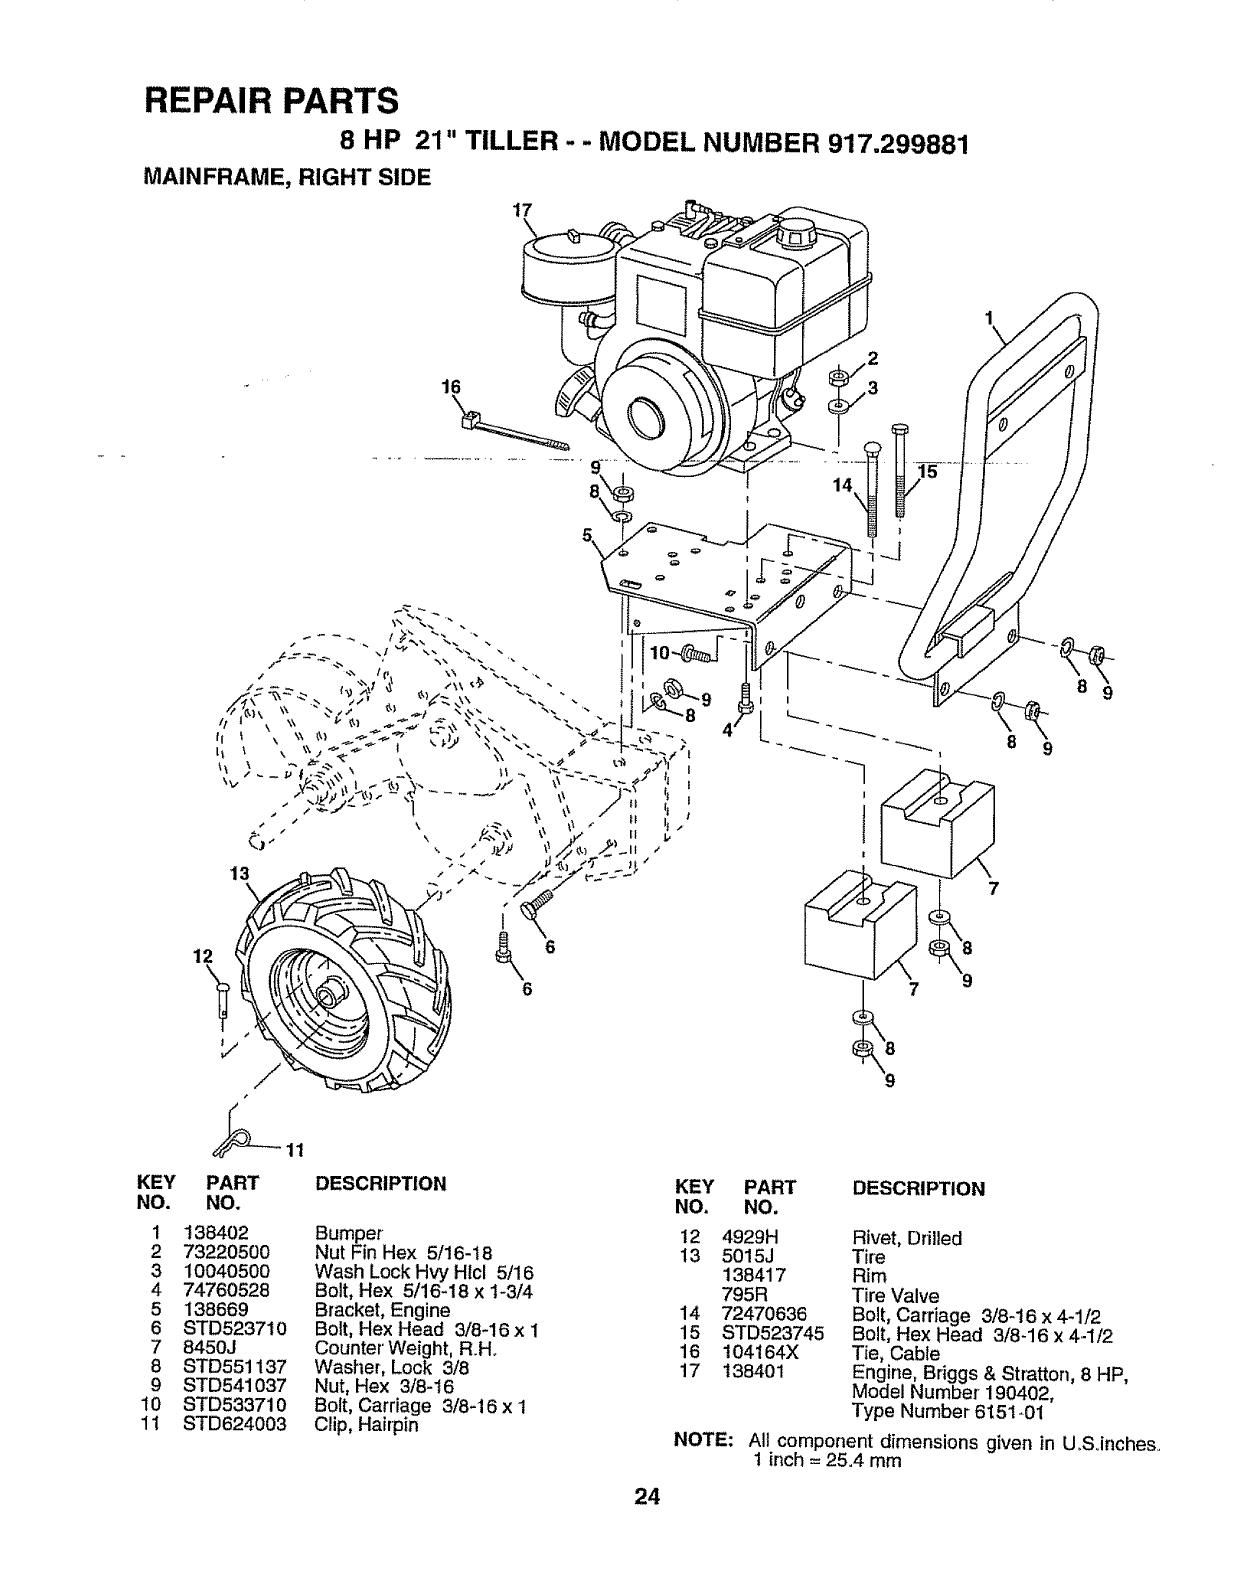 Craftsman 917299881 User Manual TILLER Manuals And Guides